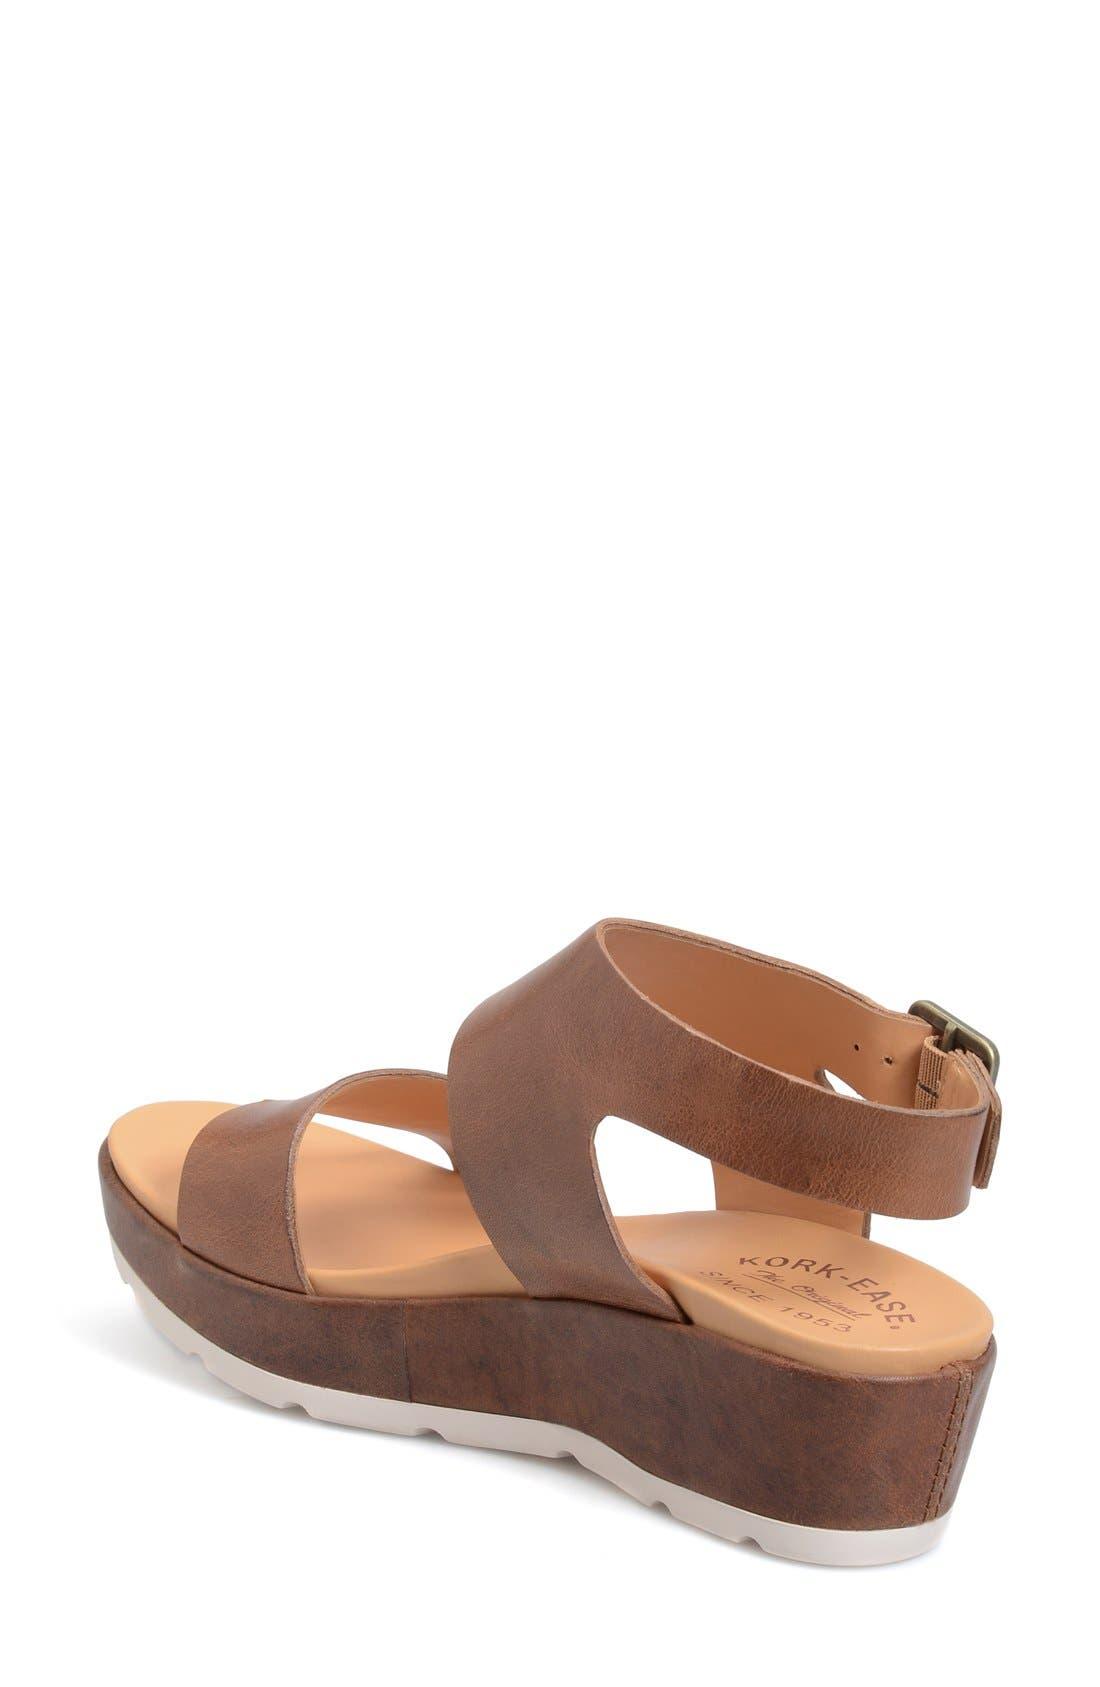 'Khloe' Platform Wedge Sandal,                             Alternate thumbnail 7, color,